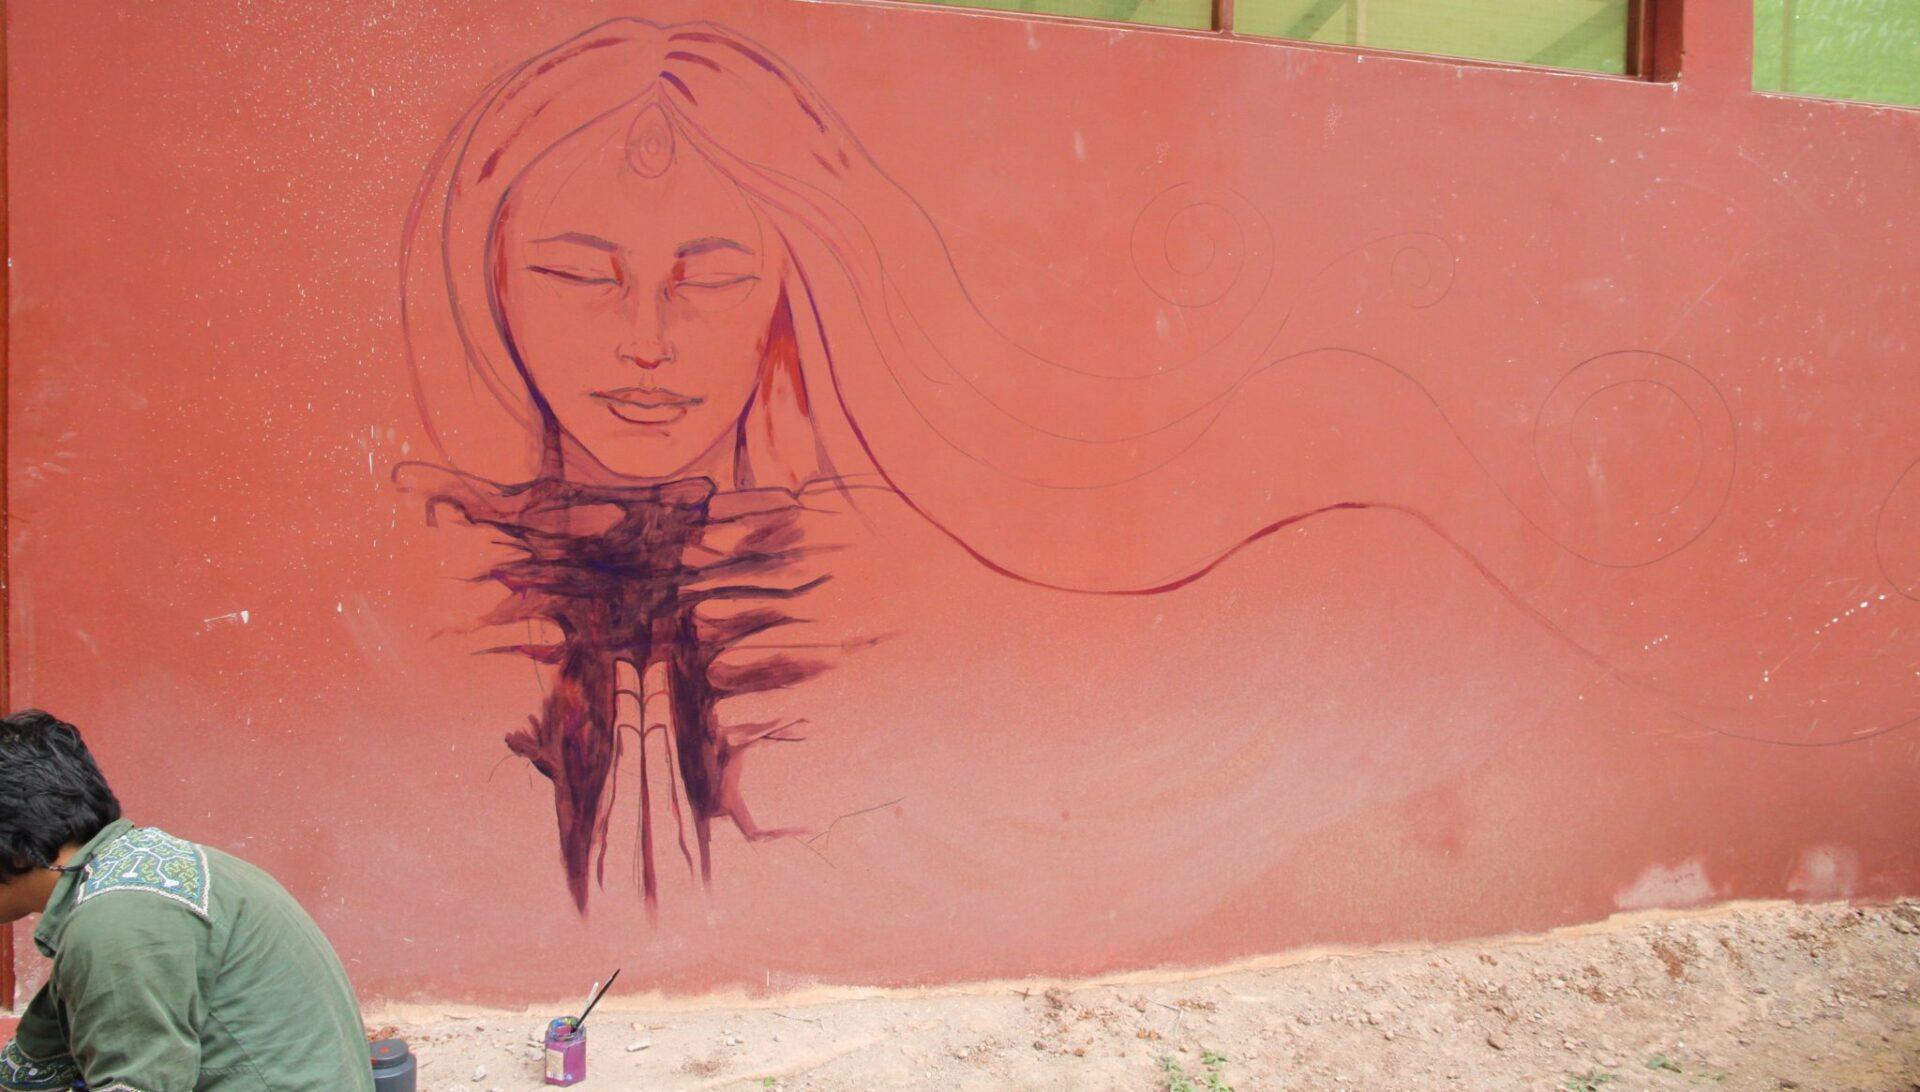 Juan Carlos Taminchi started off on his mural